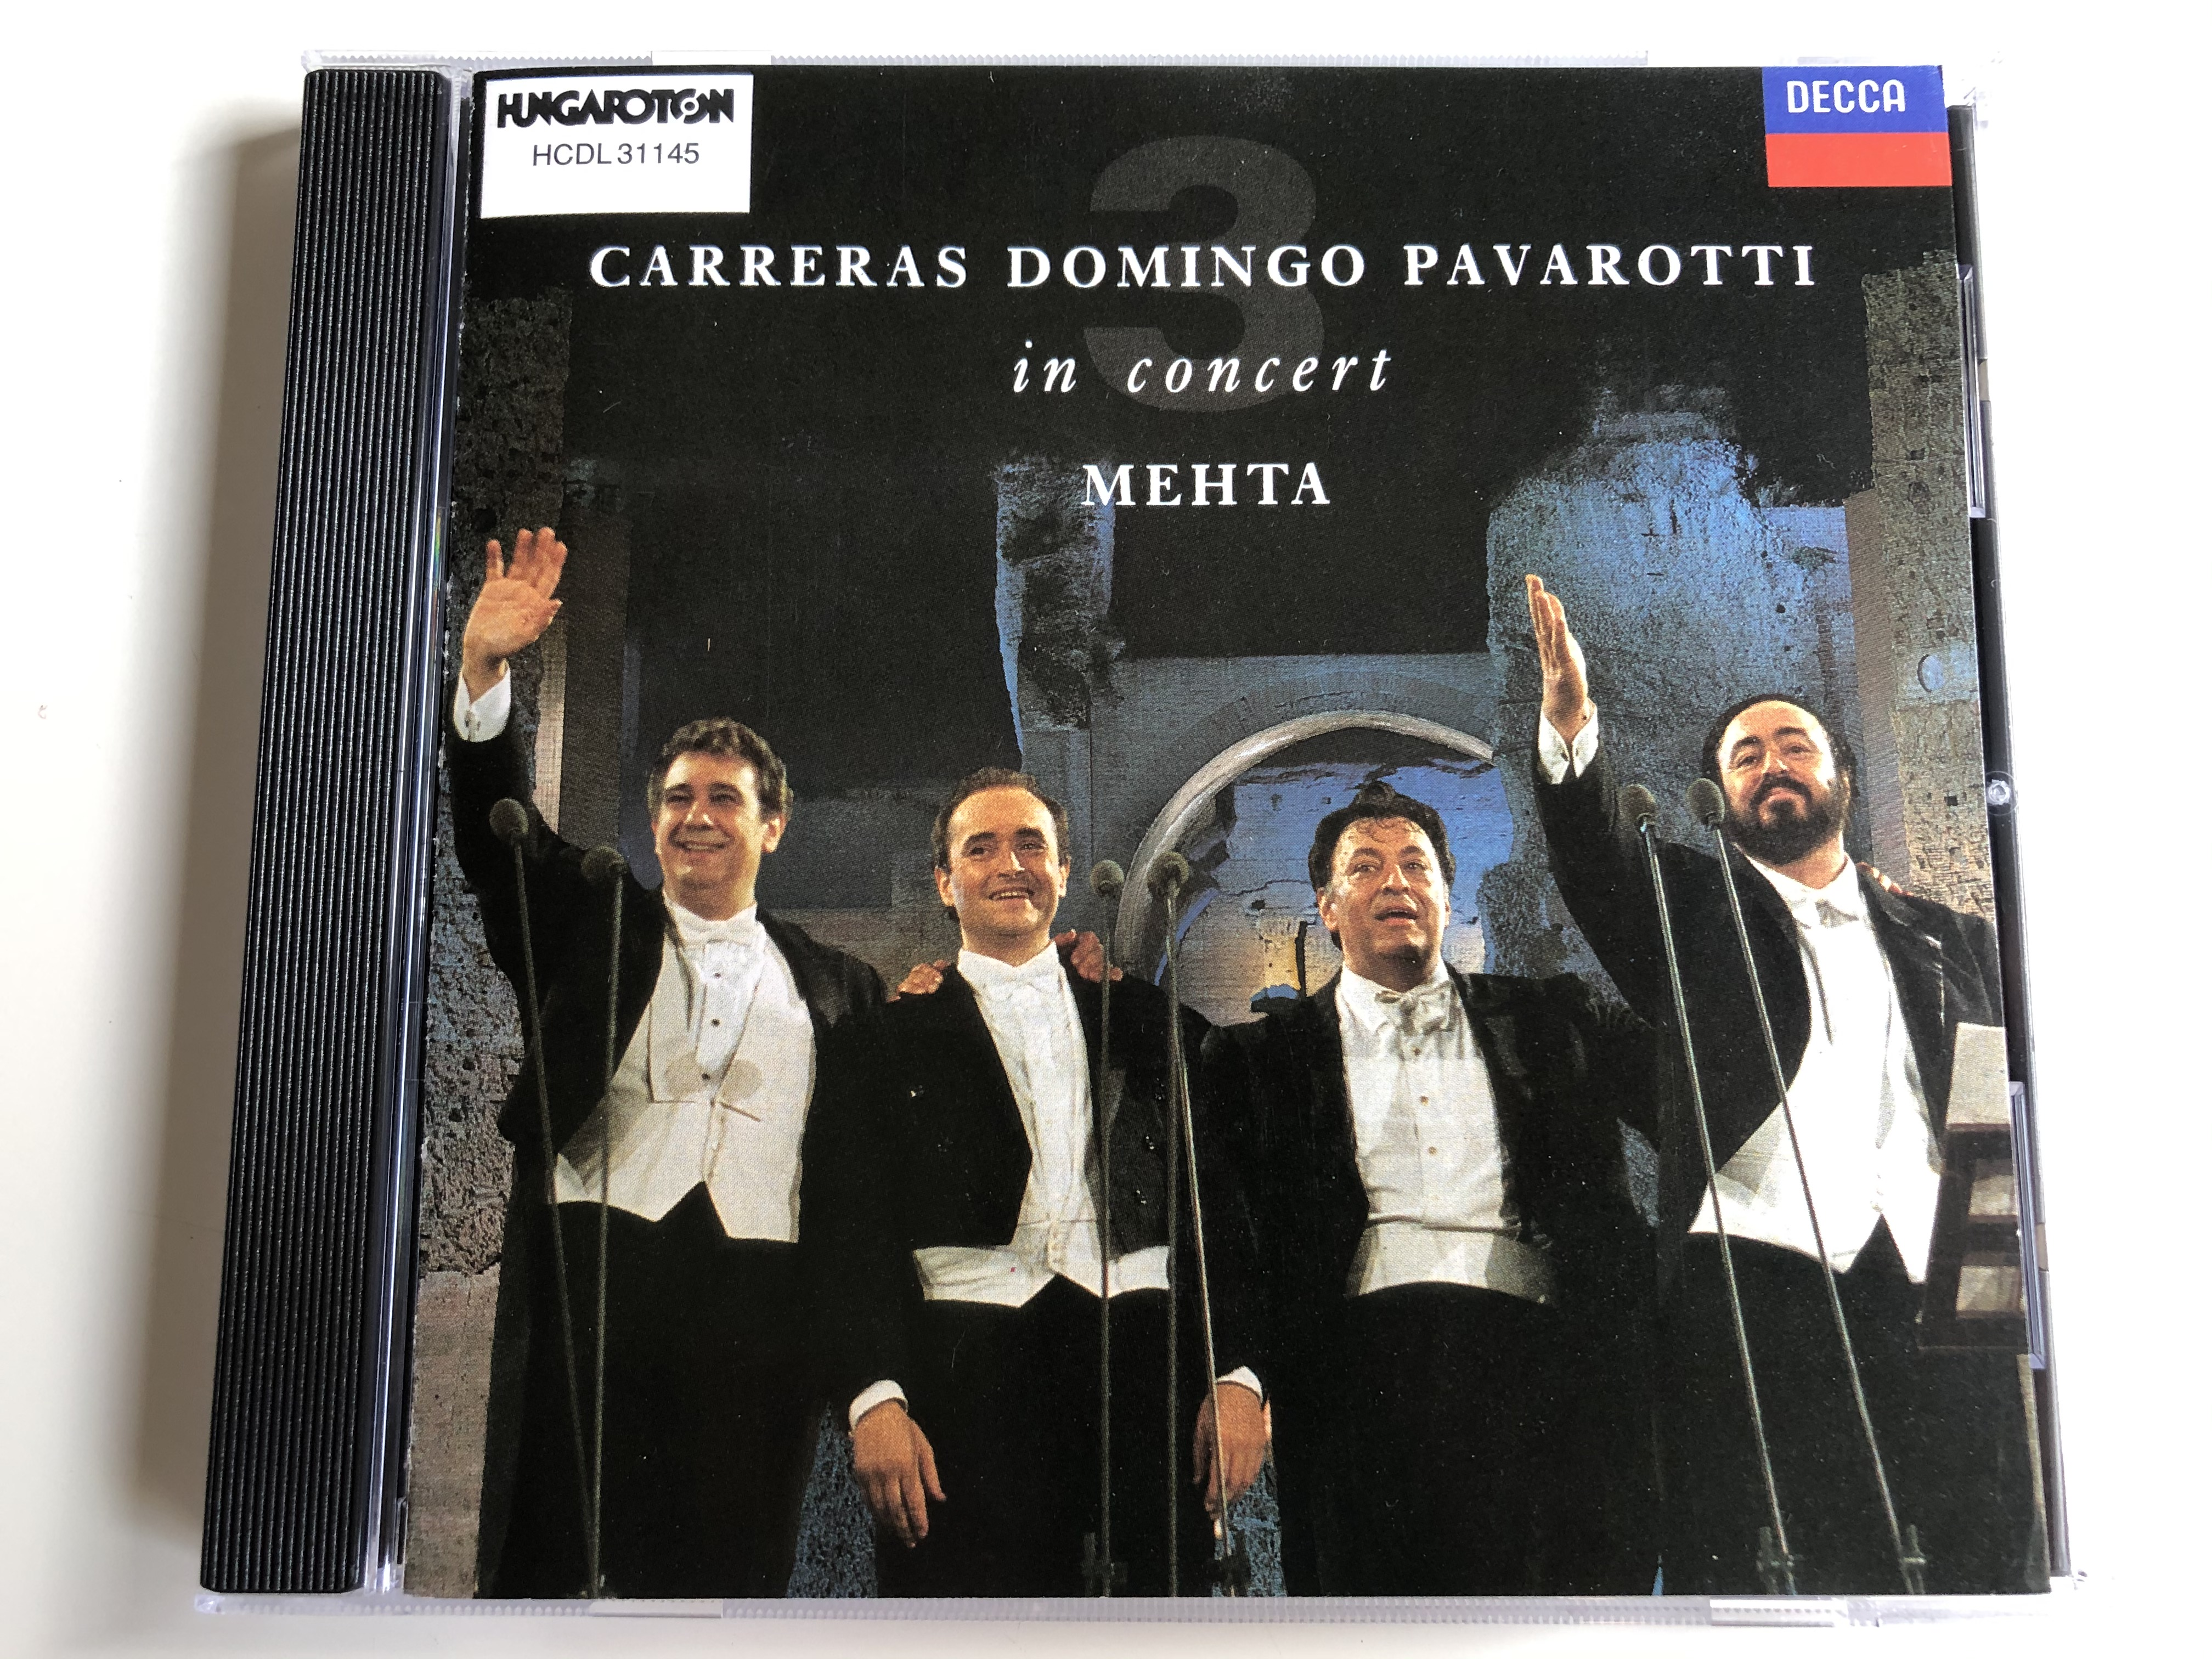 carreras-domingo-pavarotti-mehta-in-concert-hungaroton-audio-cd-1990-stereo-hcdl-31145-1-.jpg